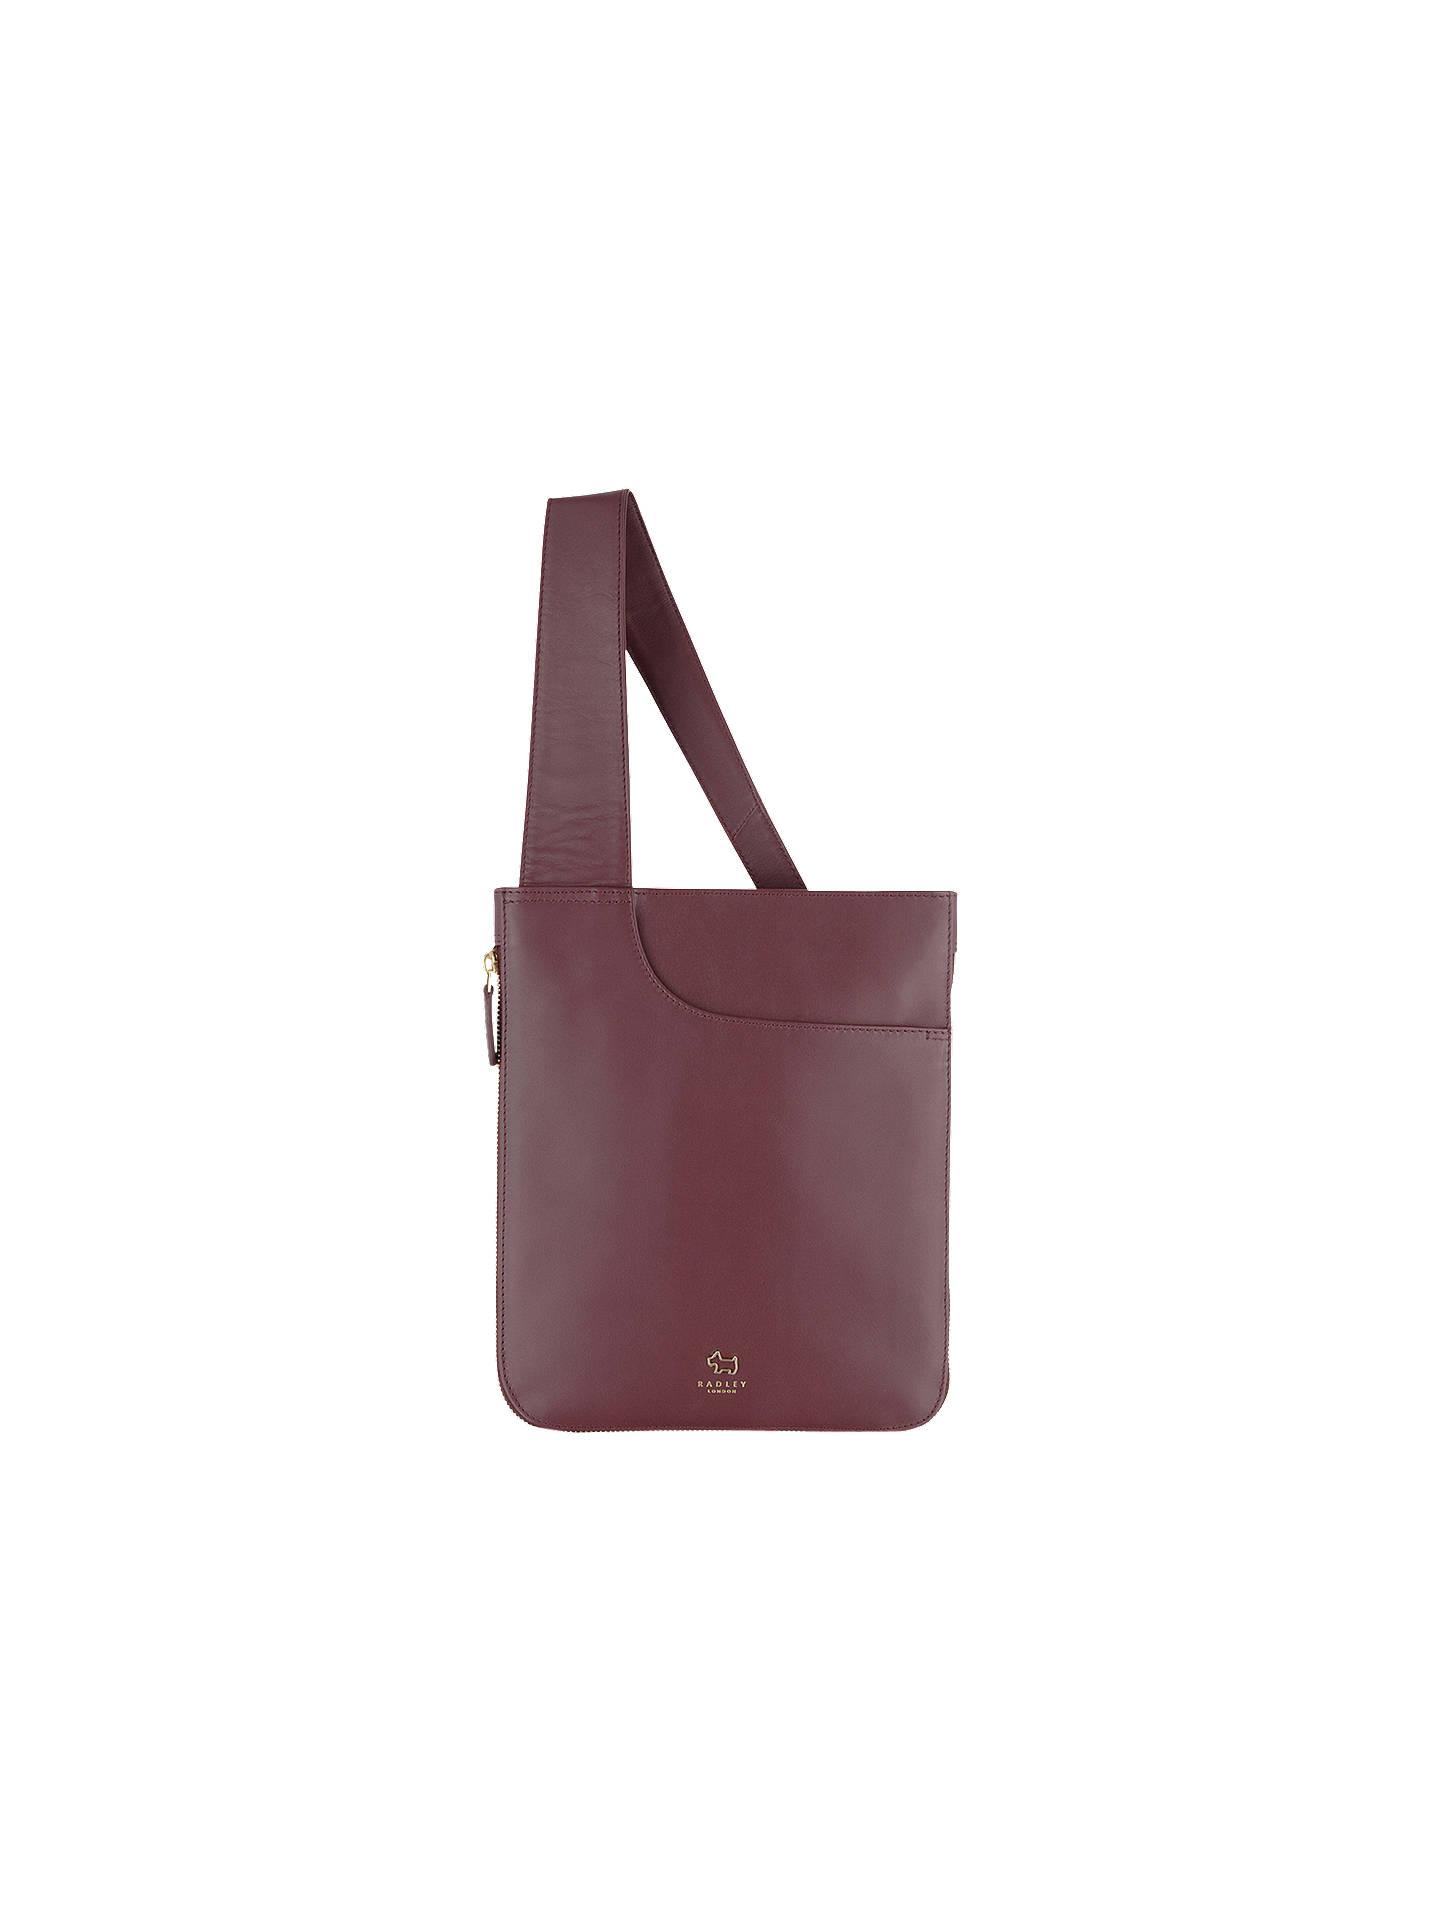 4b8d61f03b702e Radley Pockets Leather MEDIUM ZIP TOP Crossbody Bag, Burgundy, BNWT ...